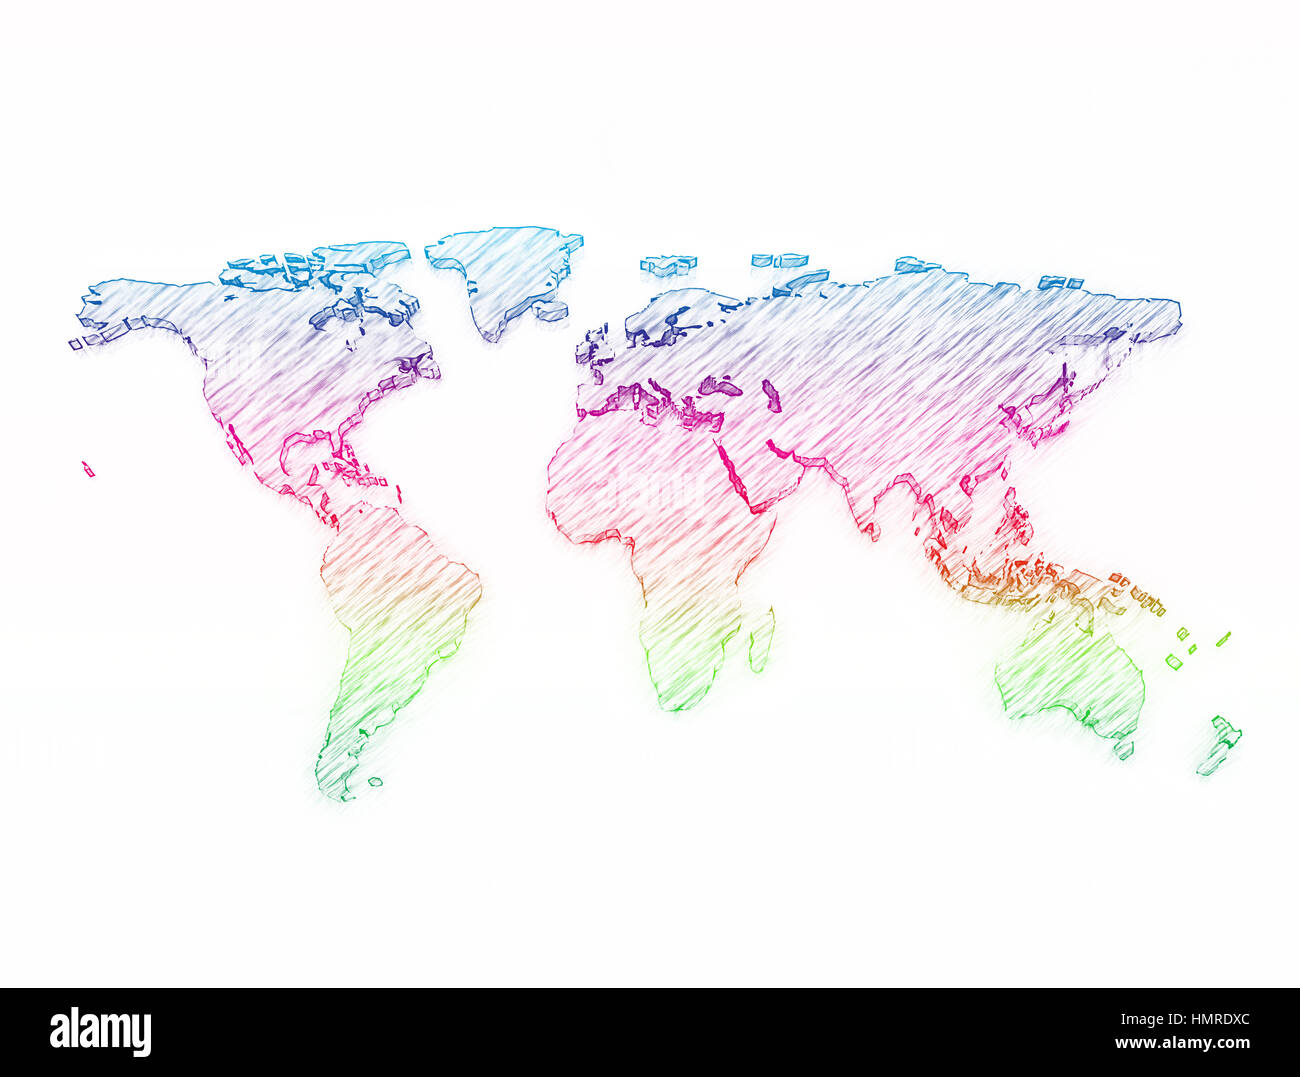 World map 3d pencil sketch multi color stock photo 133281524 alamy world map 3d pencil sketch multi color gumiabroncs Gallery